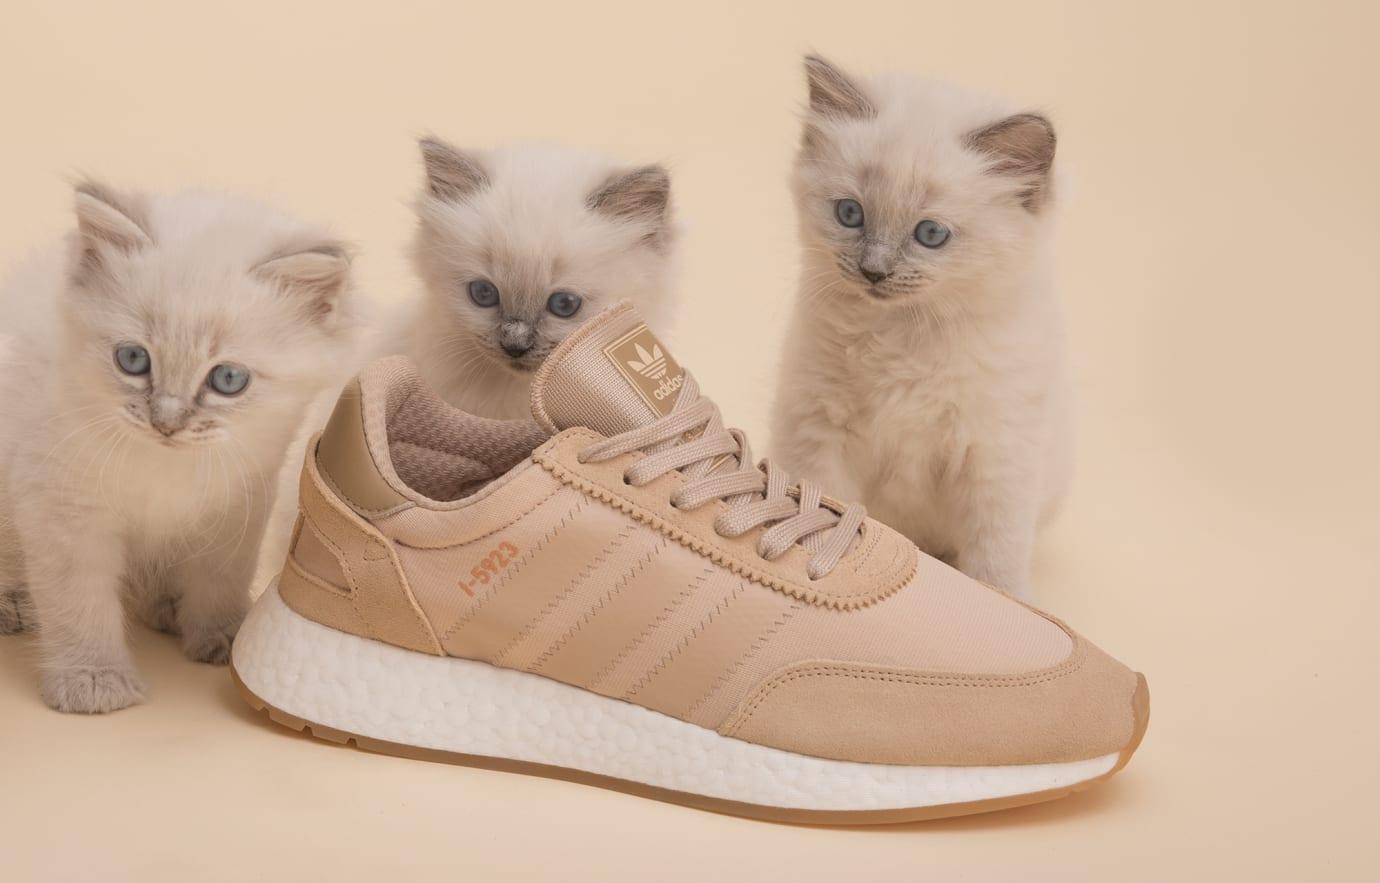 Sneakersnstuff Adidas I-5923 'Pale Nude' B43526 (Detail)